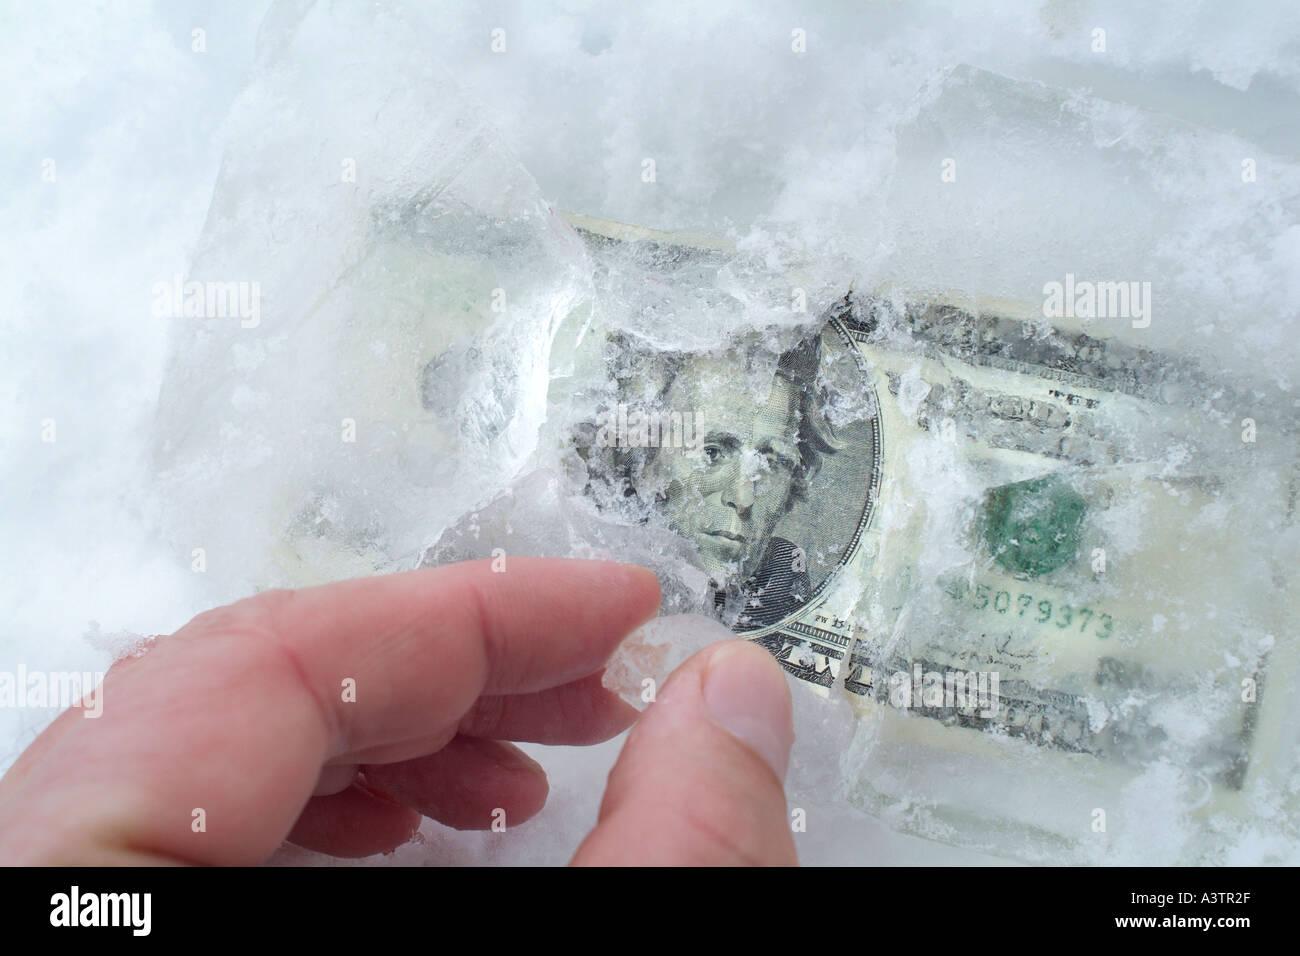 Hand finding frozen money in ice - Stock Image